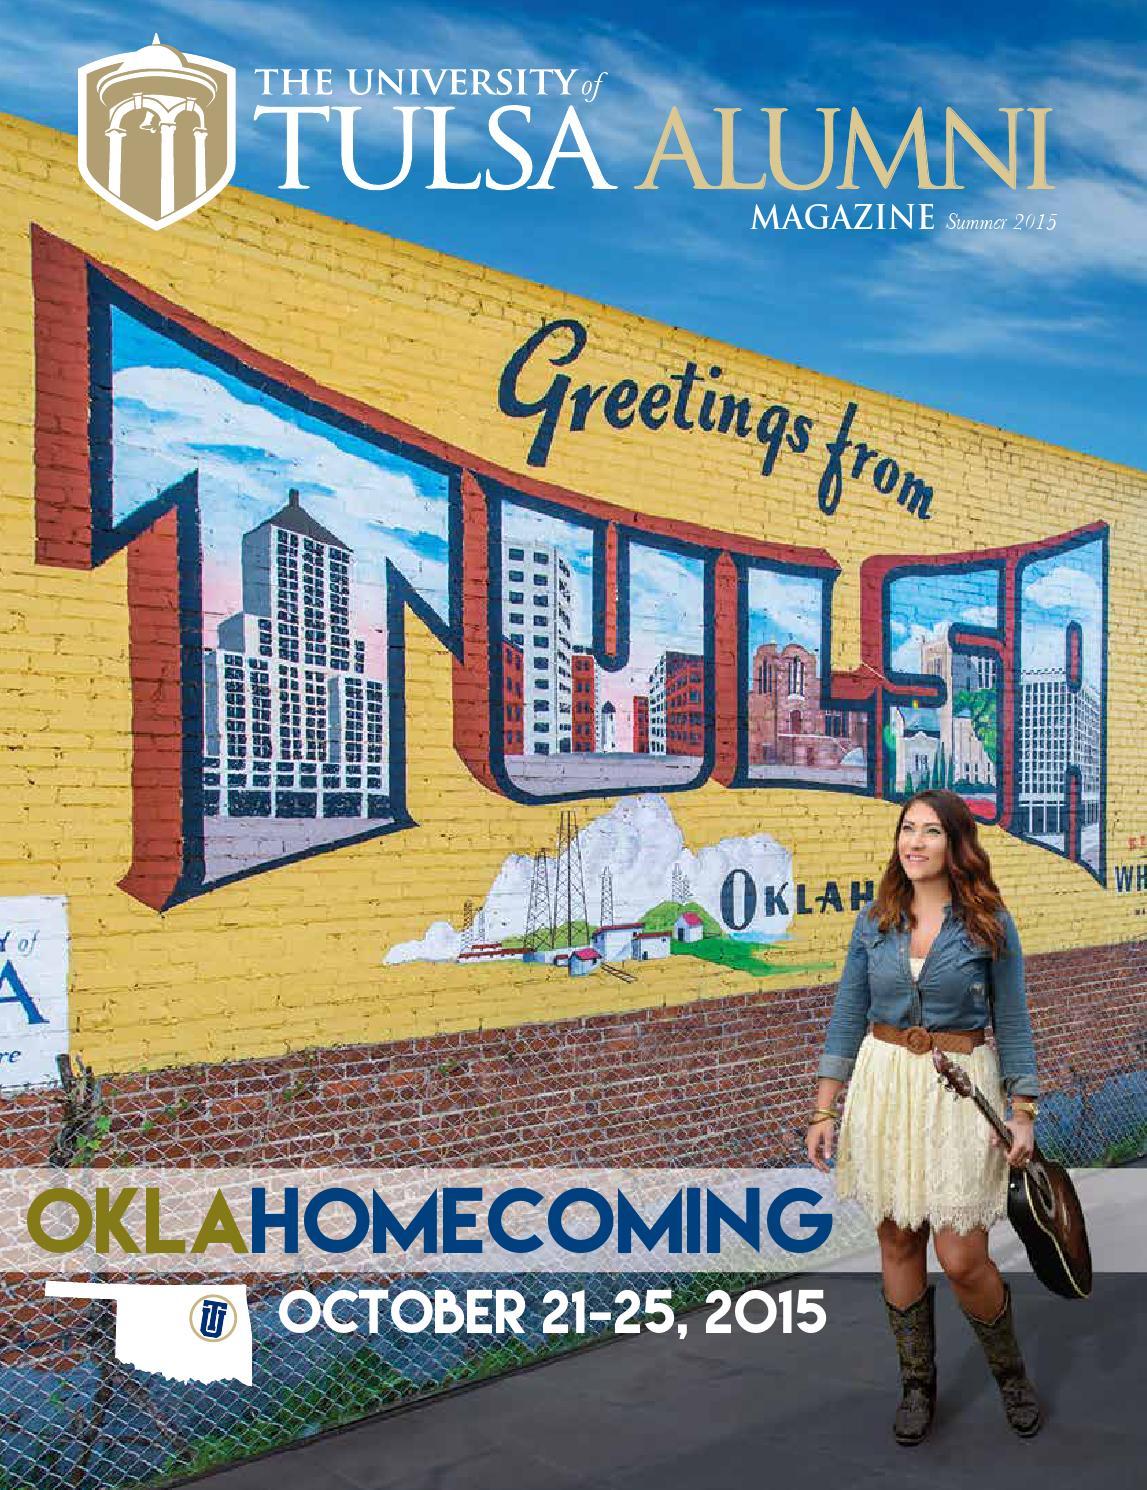 TU Alumni Magazine - Homecoming 2015 by The University of